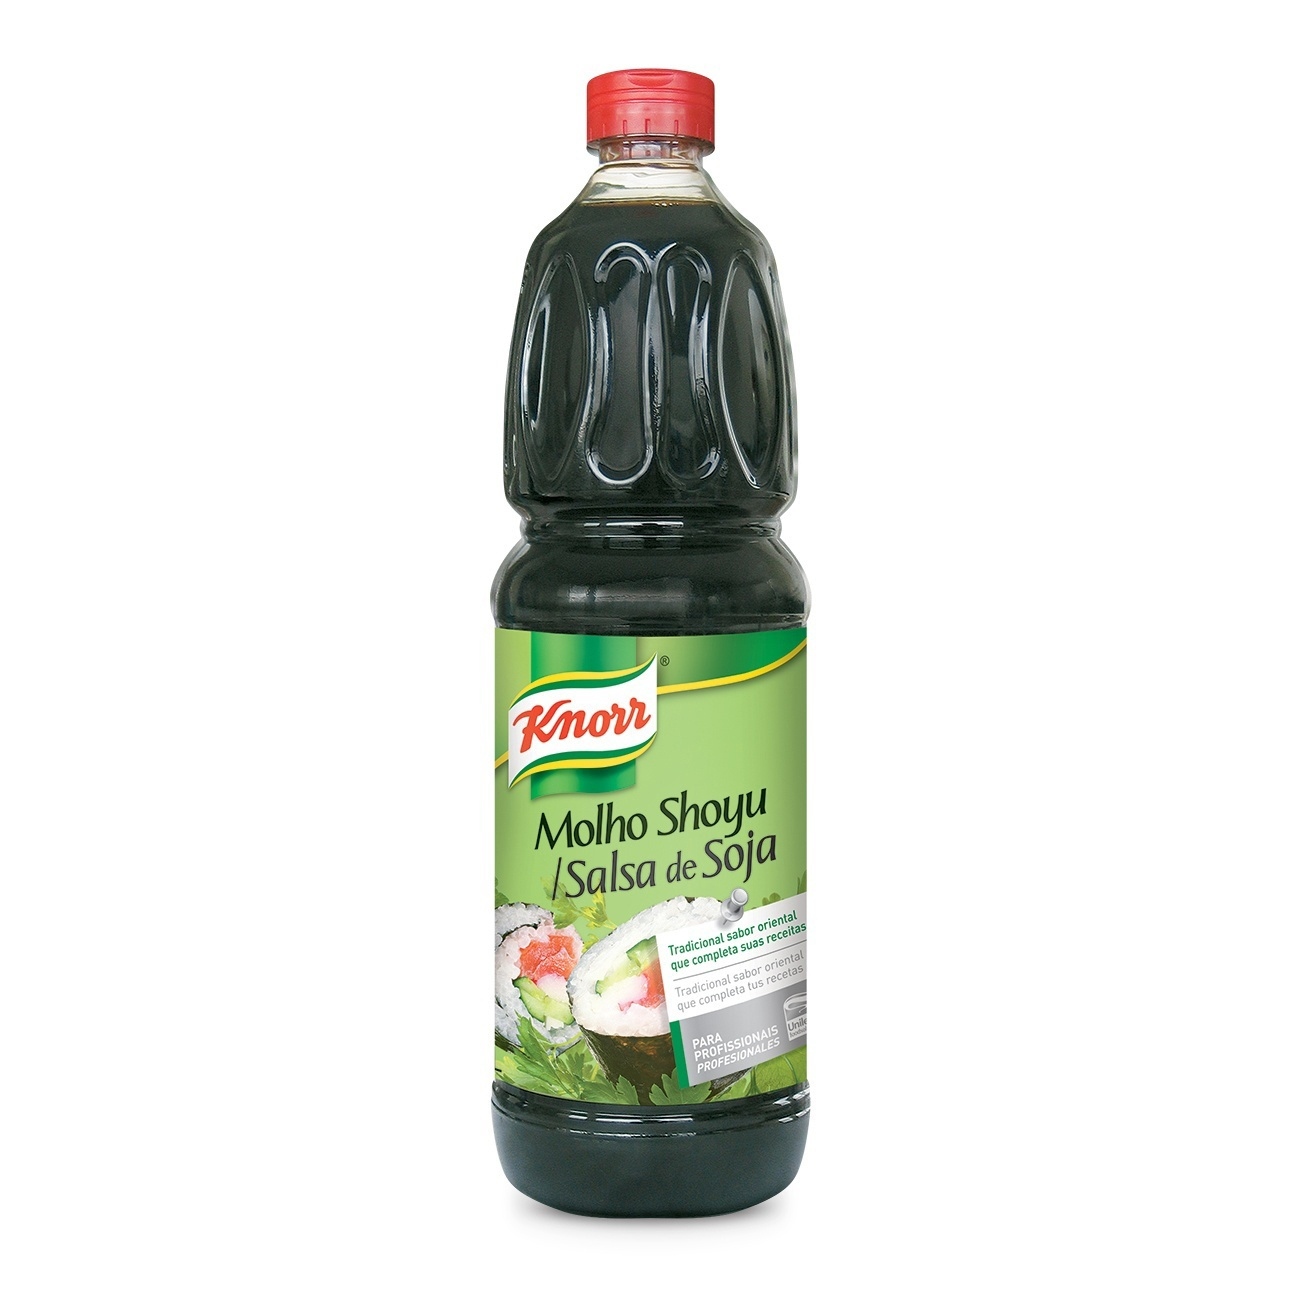 Molho Shoyu Knorr 1L